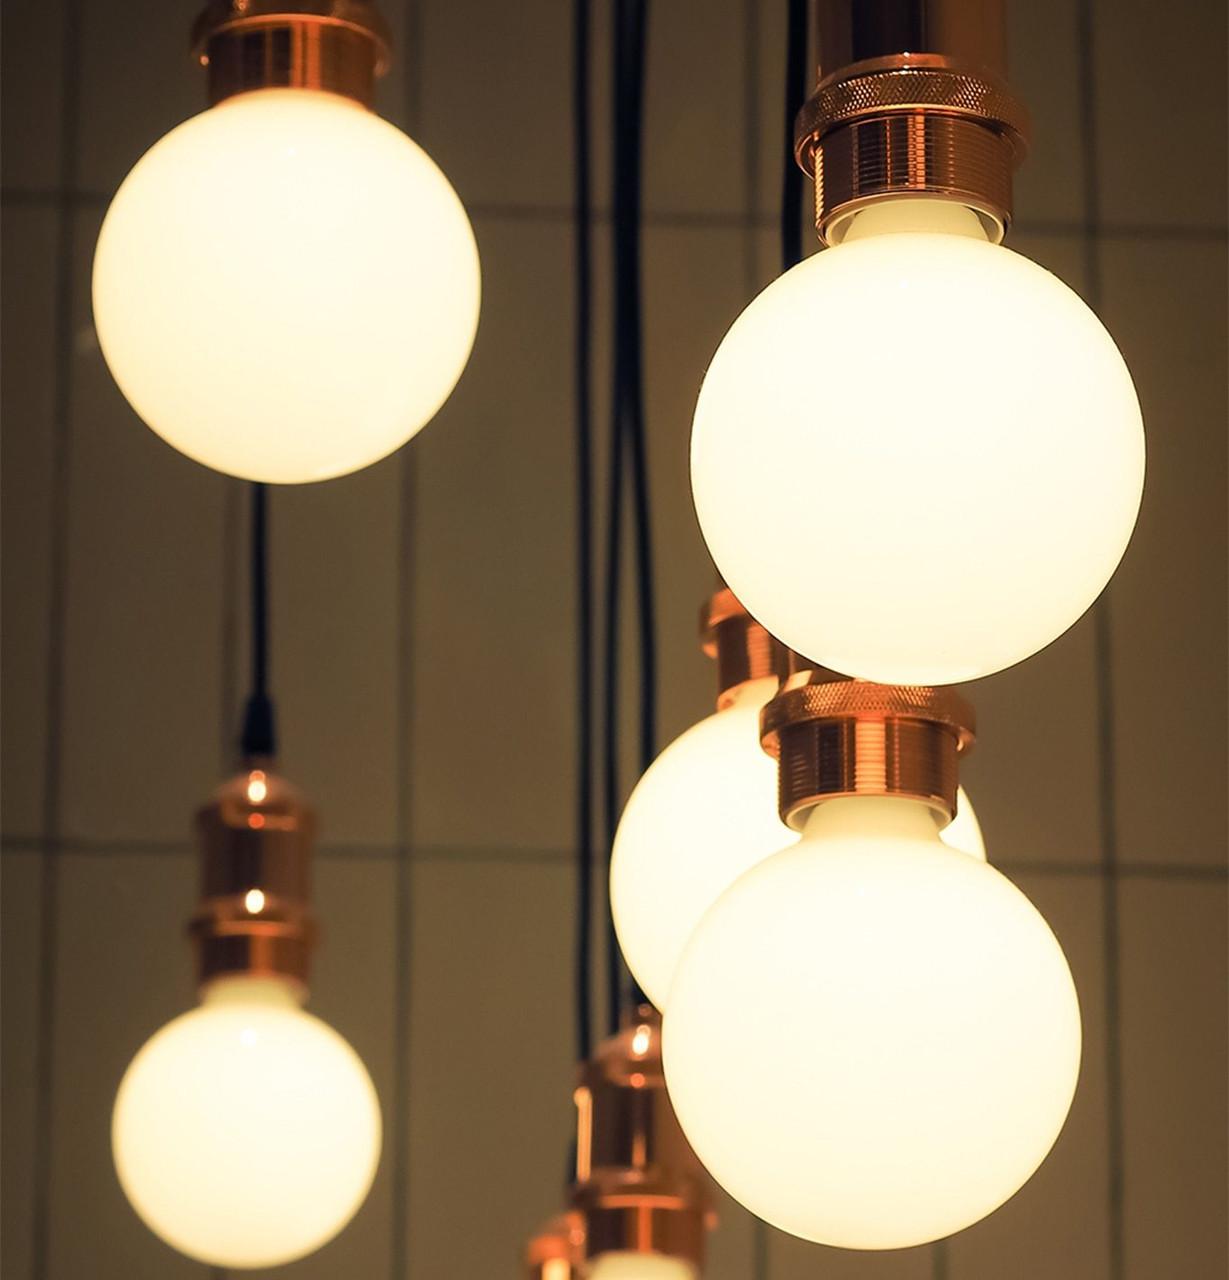 LED Dimmable G125 2200K Light Bulbs